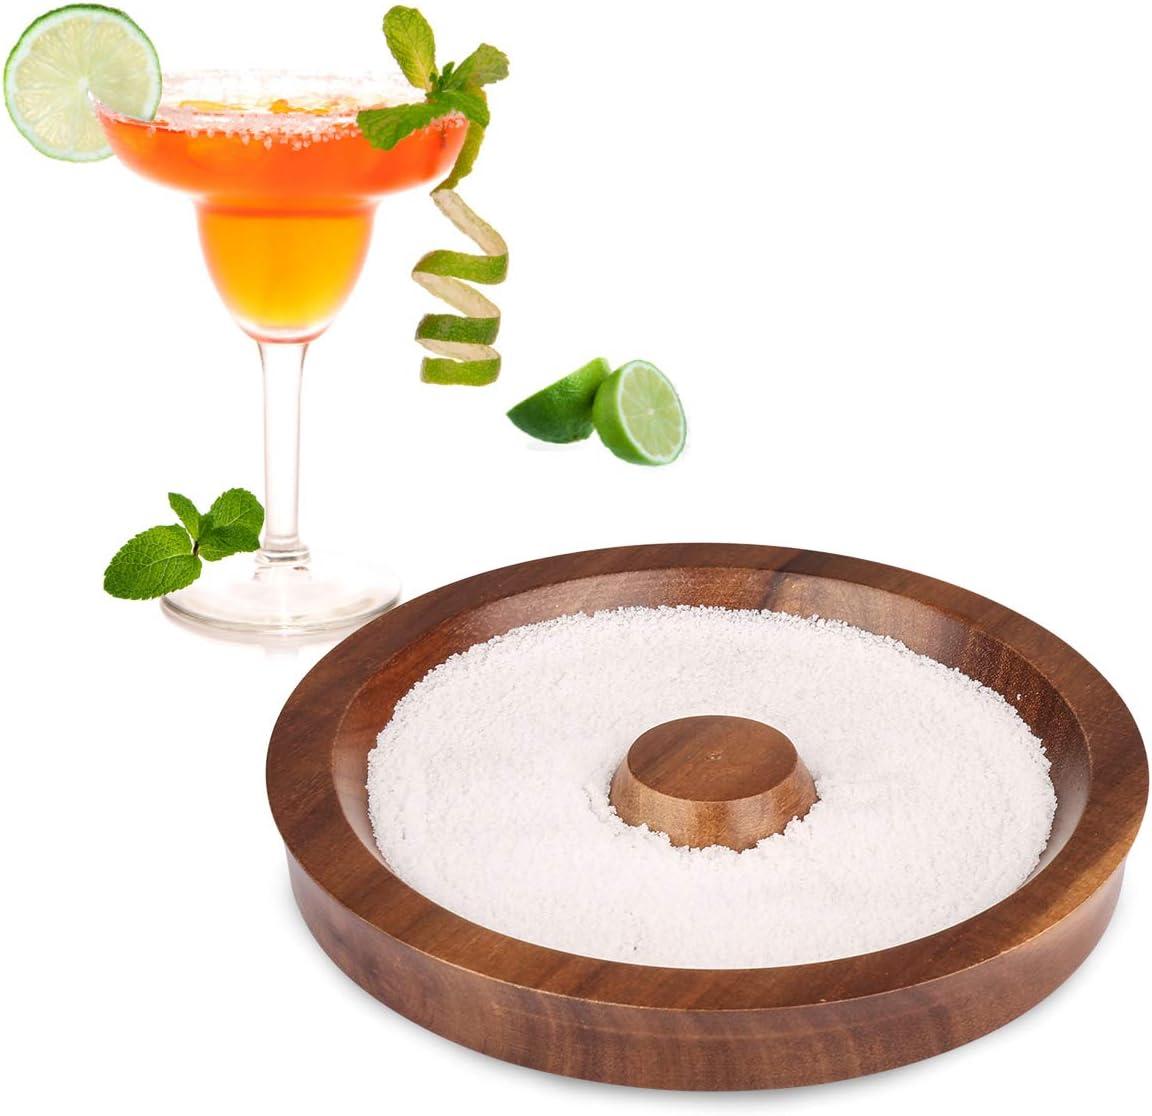 Rimmer in vetro a 3 livelli Margarita Salt Rimmer con zucchero acrilico Sale Rimmer Lime Glass per cocktail Bartender Tool Party Home Black